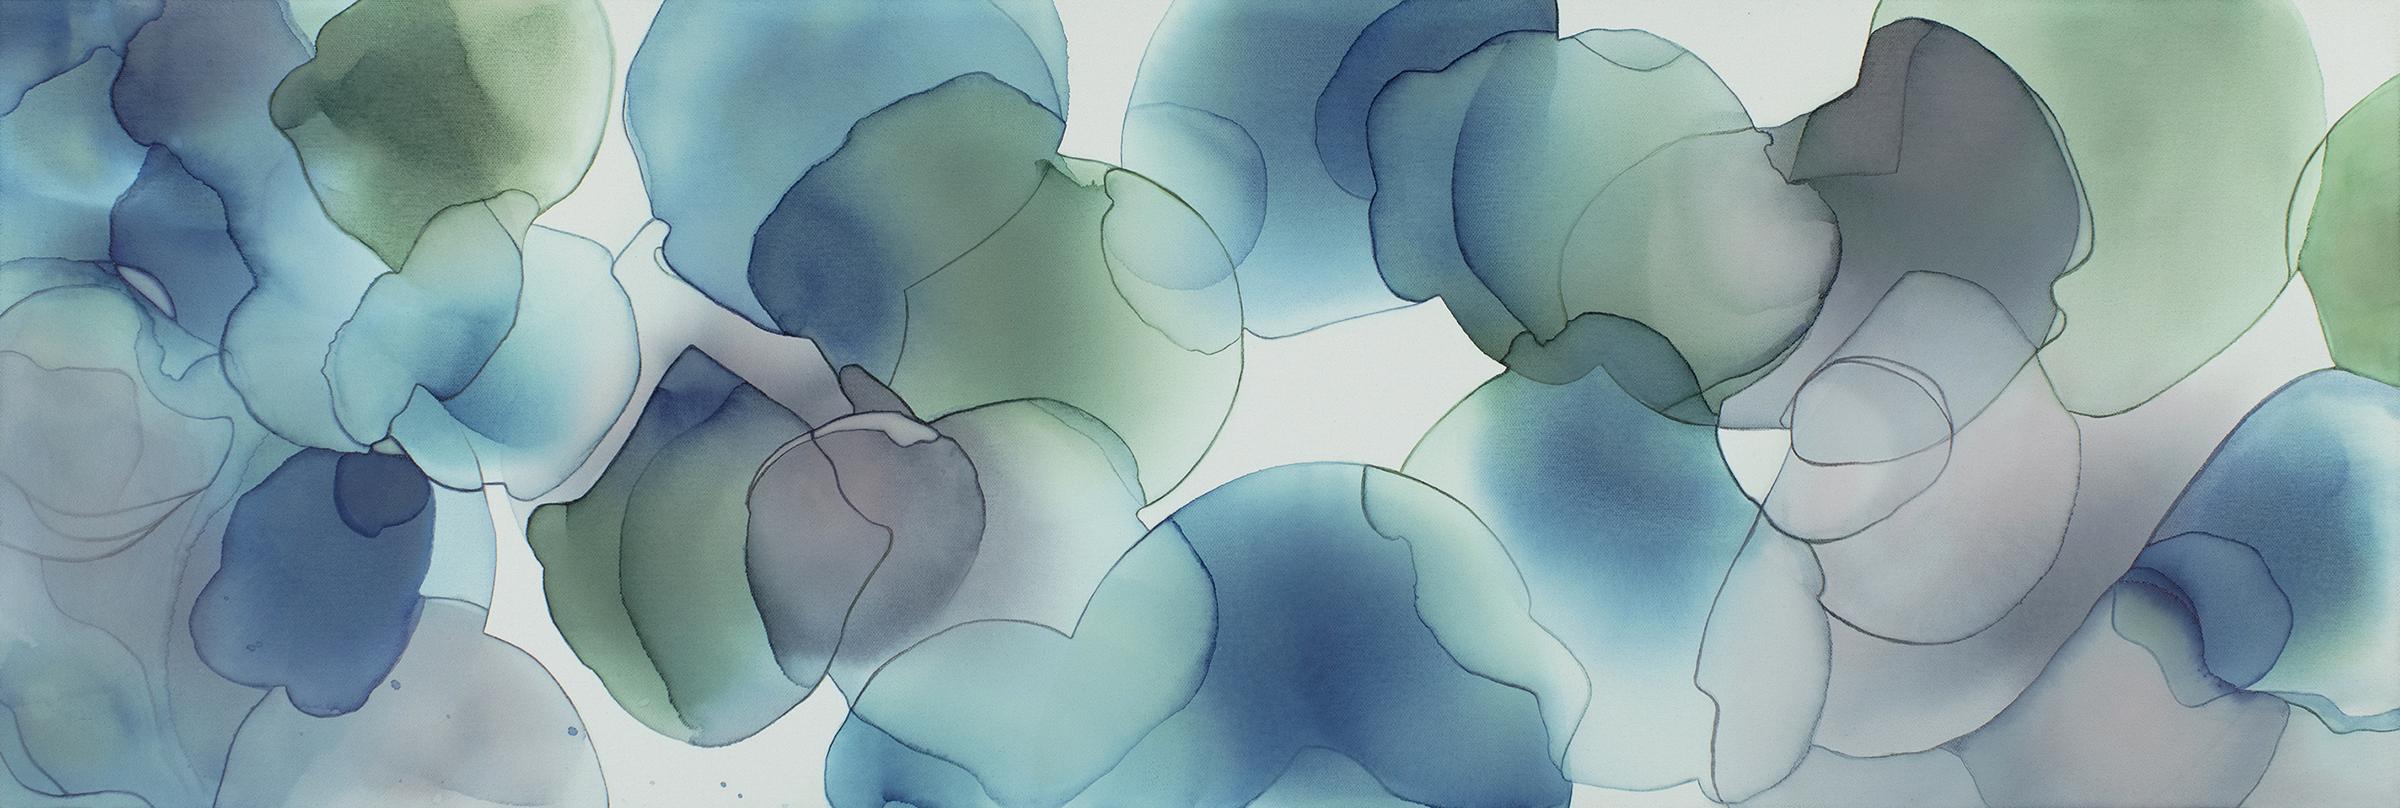 "Study for Shizuku , ink and acrylic on canvas, 12""x36"" original."